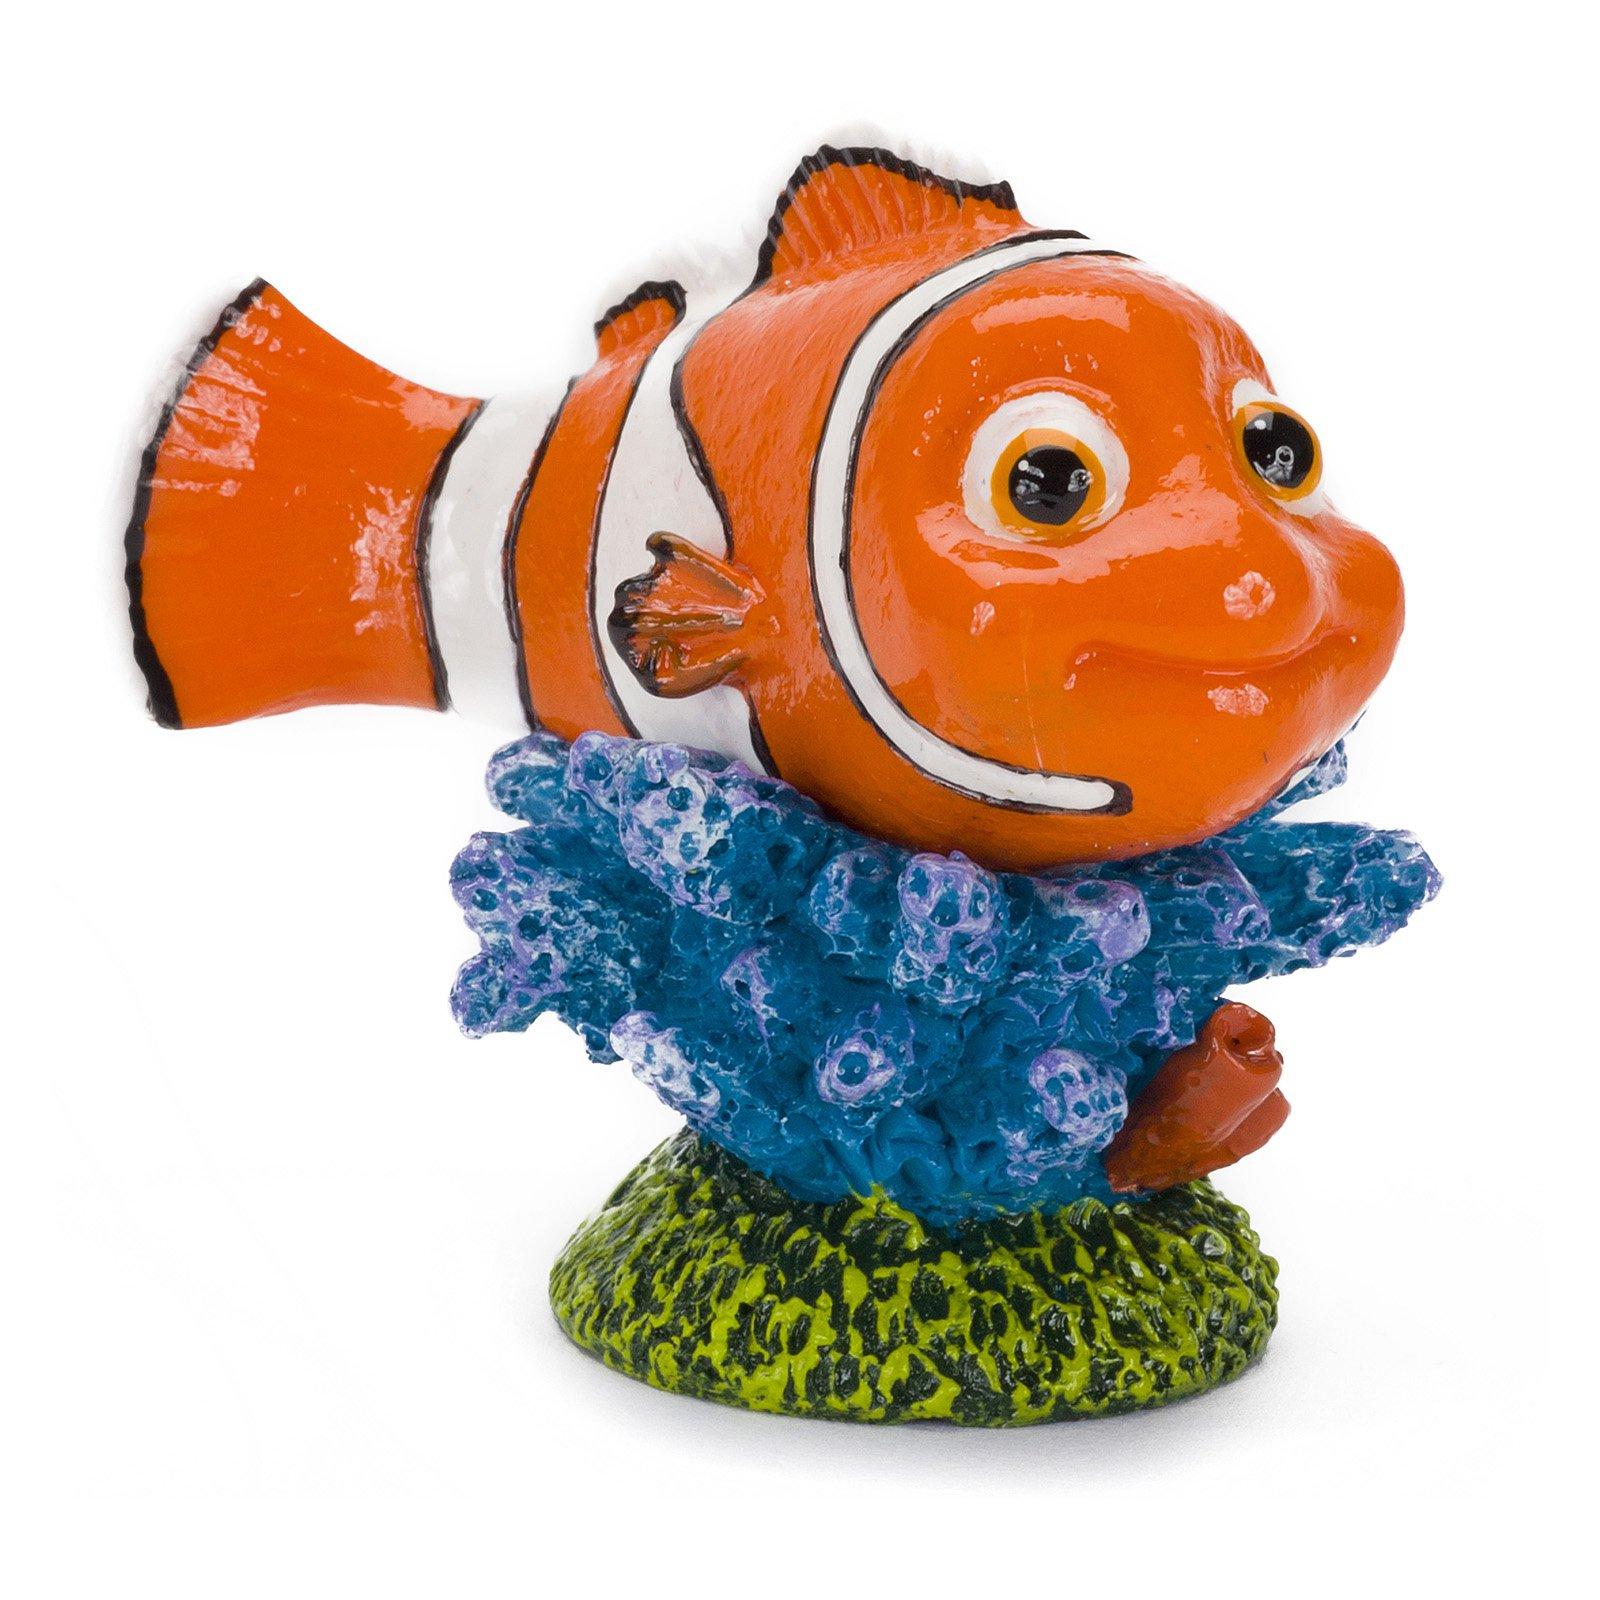 Penn-Plax Finding Nemo on Coral Aquarium Ornament, Mini